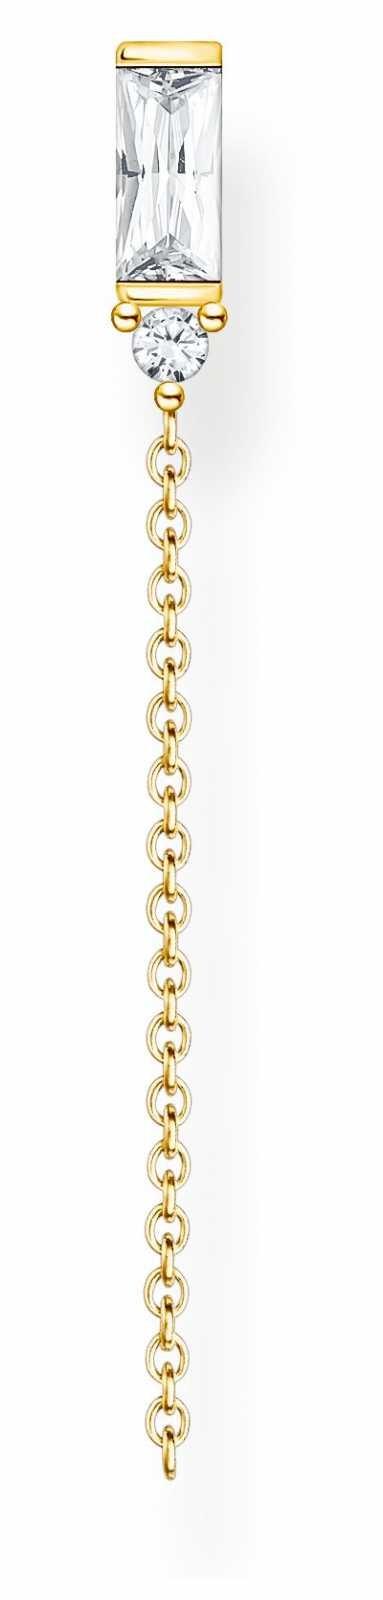 Thomas Sabo Gold Plated Single Drop Stud Earring | Baguette Cut Stone H2183-414-14